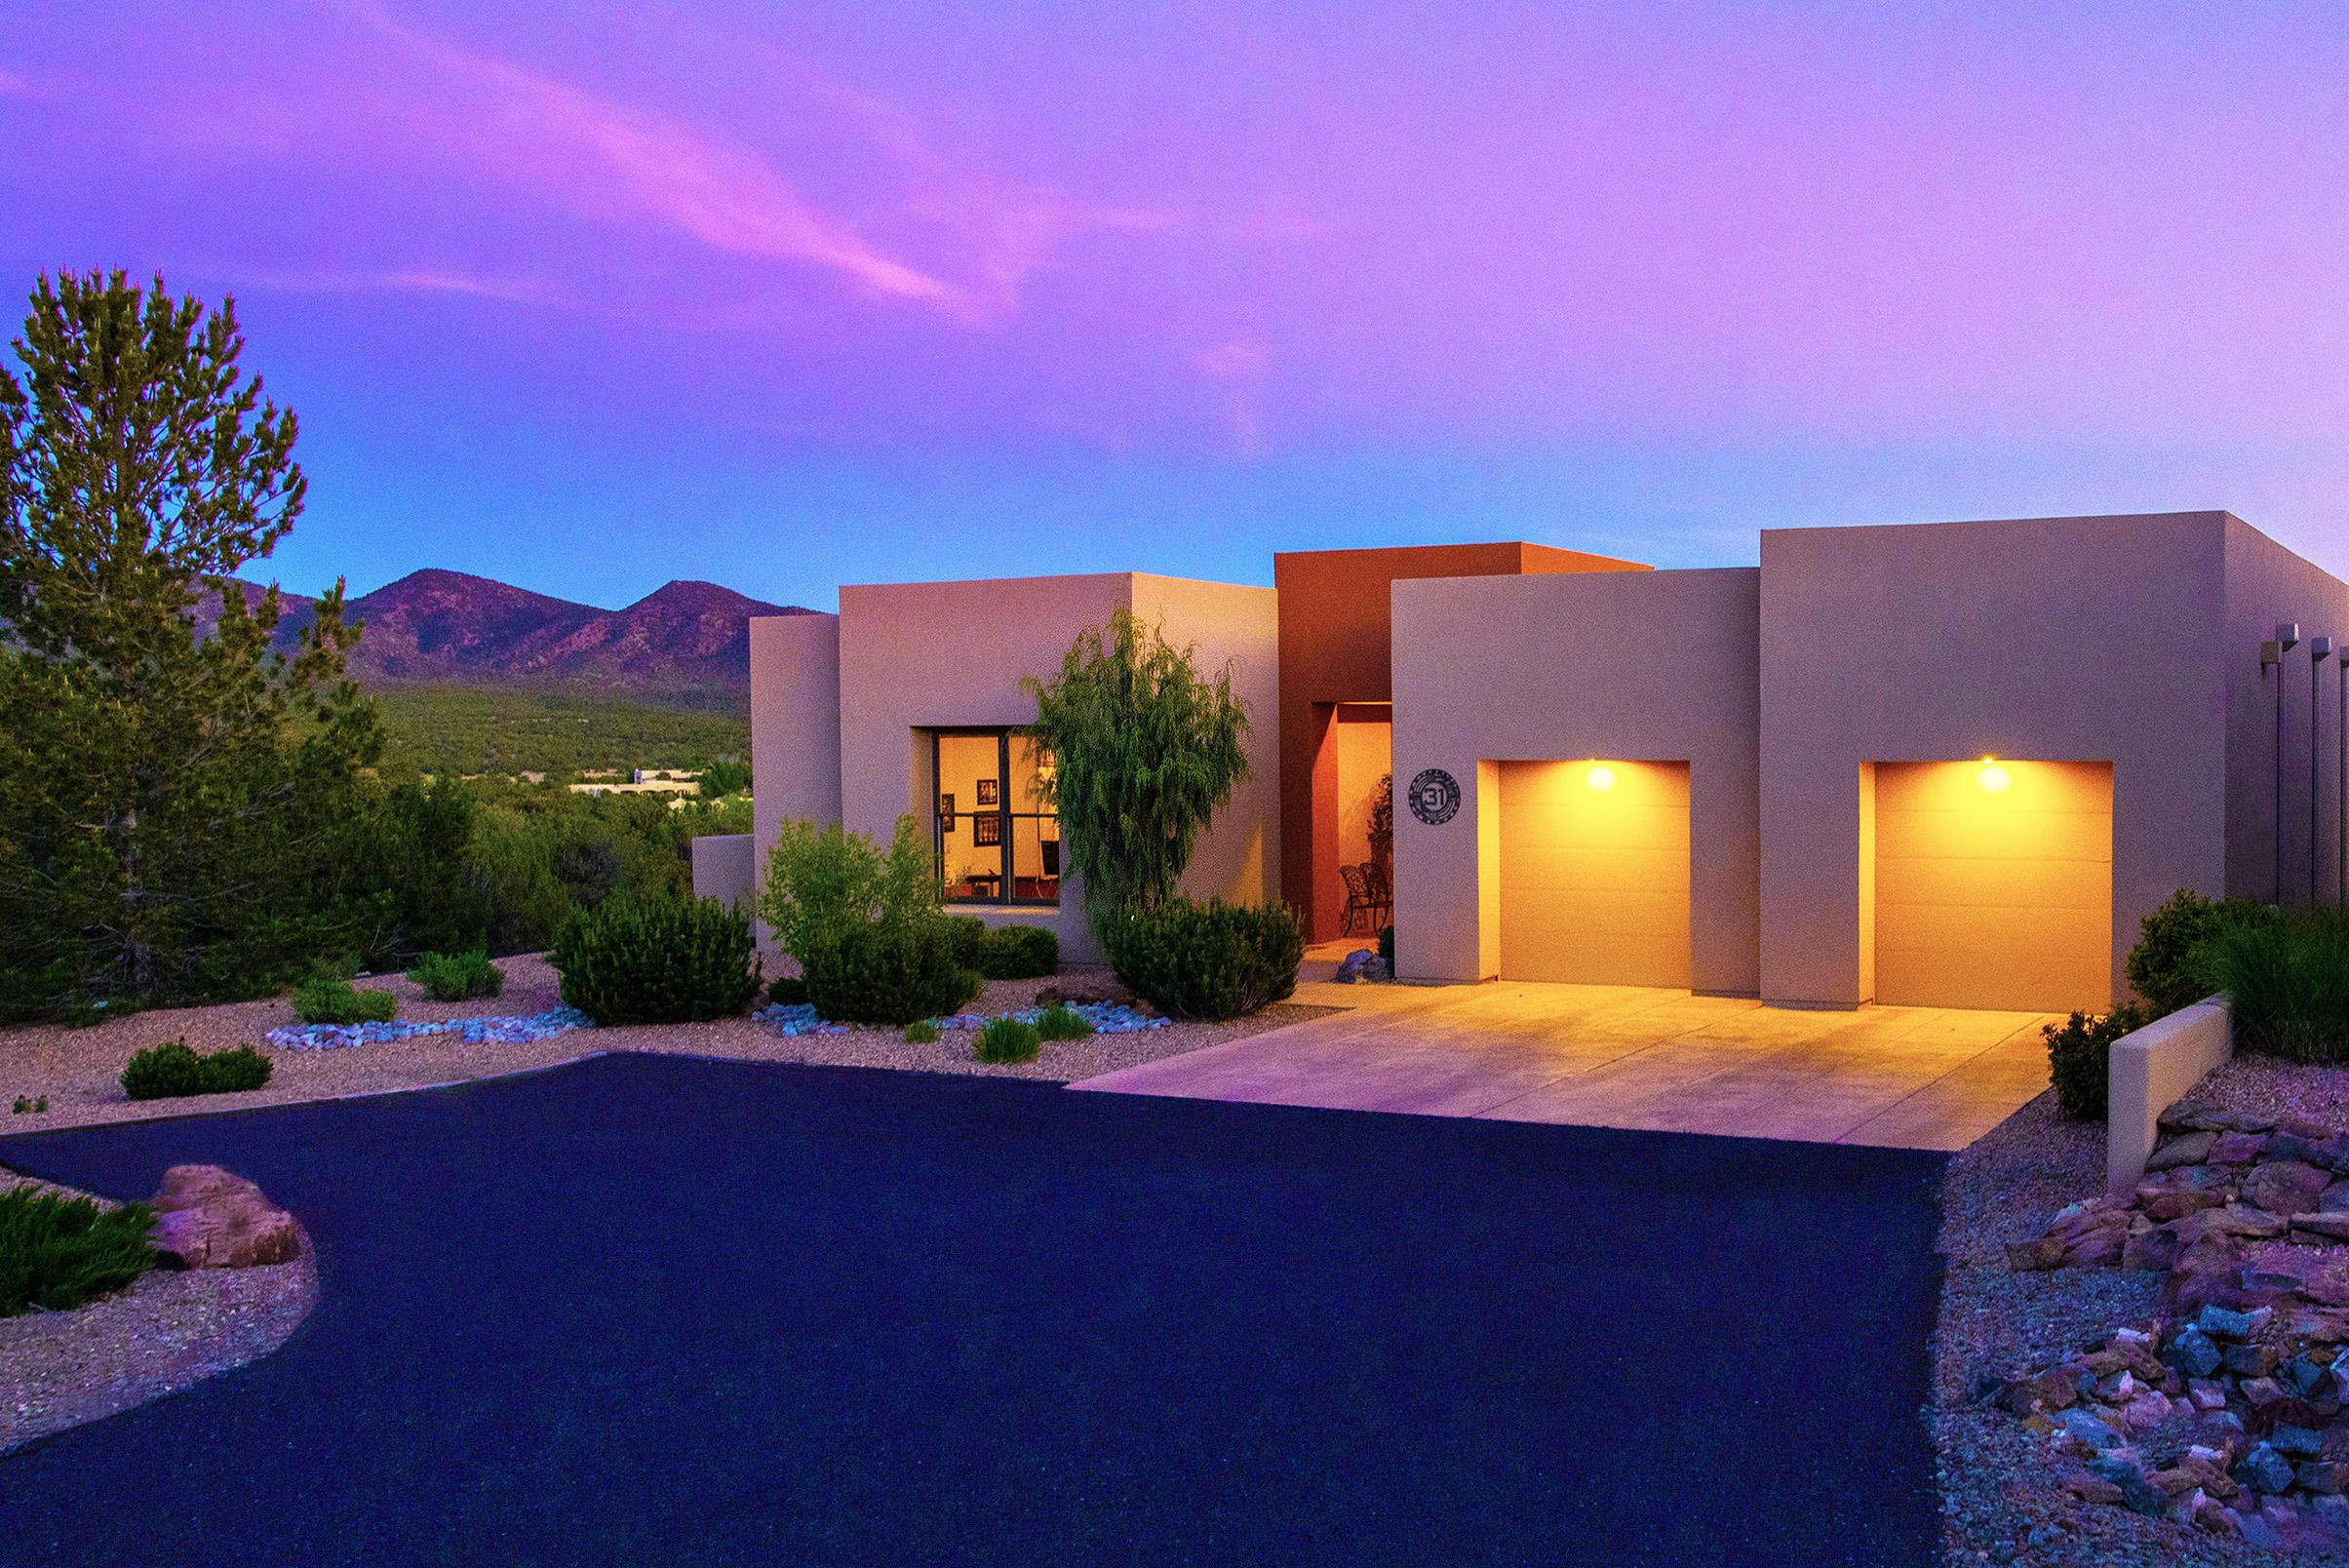 31 Hogan Court, Sandia Park, NM 87047 - Sandia Park, NM real estate listing